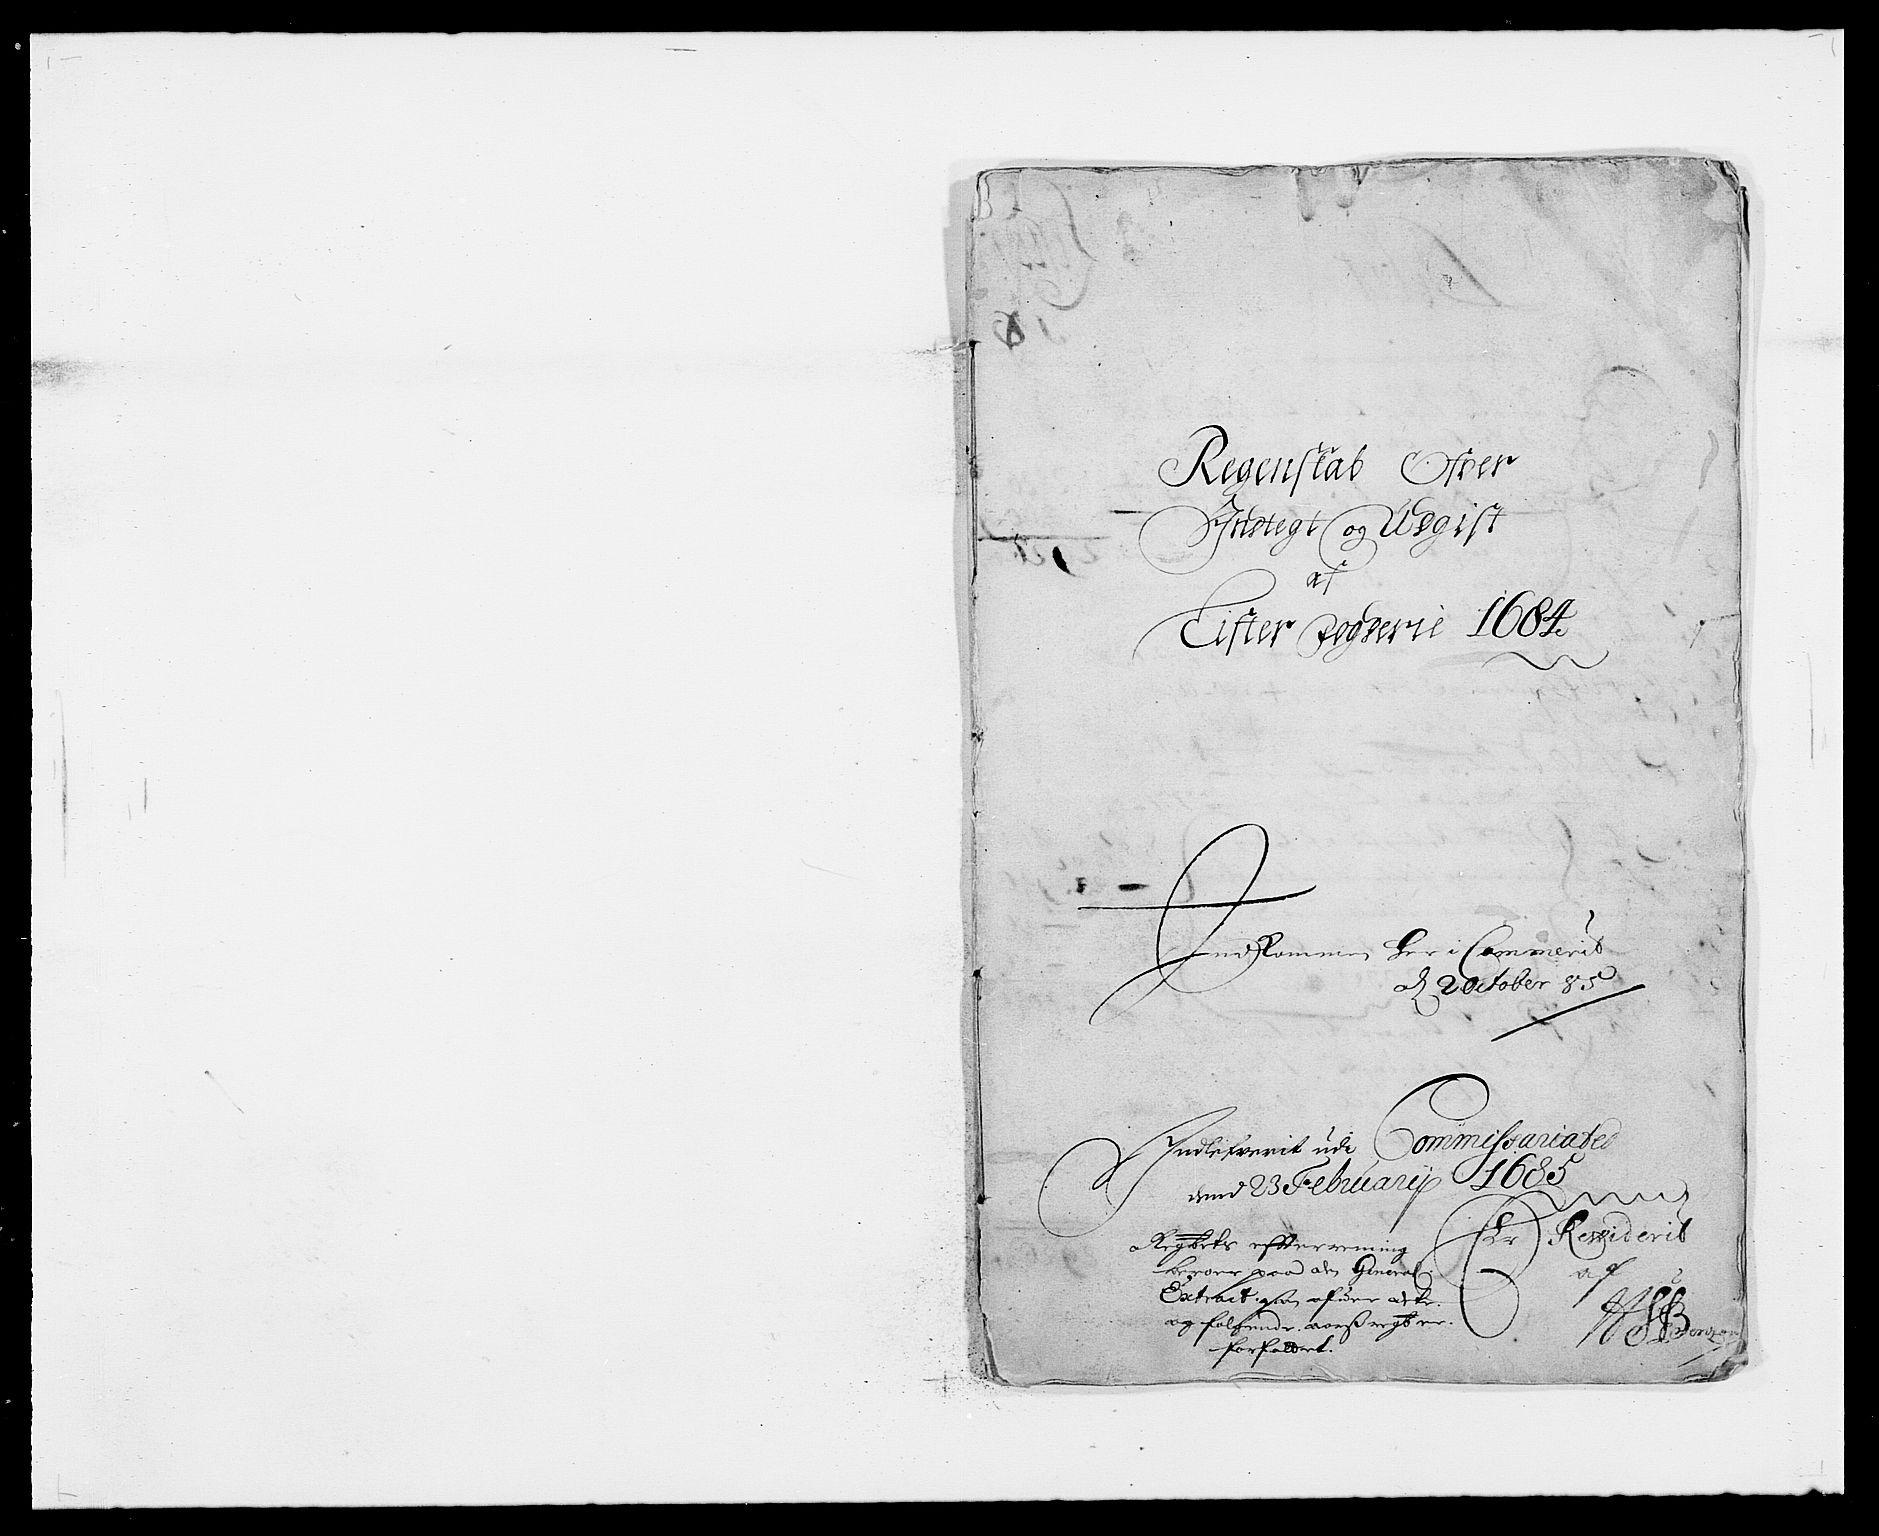 RA, Rentekammeret inntil 1814, Reviderte regnskaper, Fogderegnskap, R41/L2533: Fogderegnskap Lista, 1684-1685, s. 1